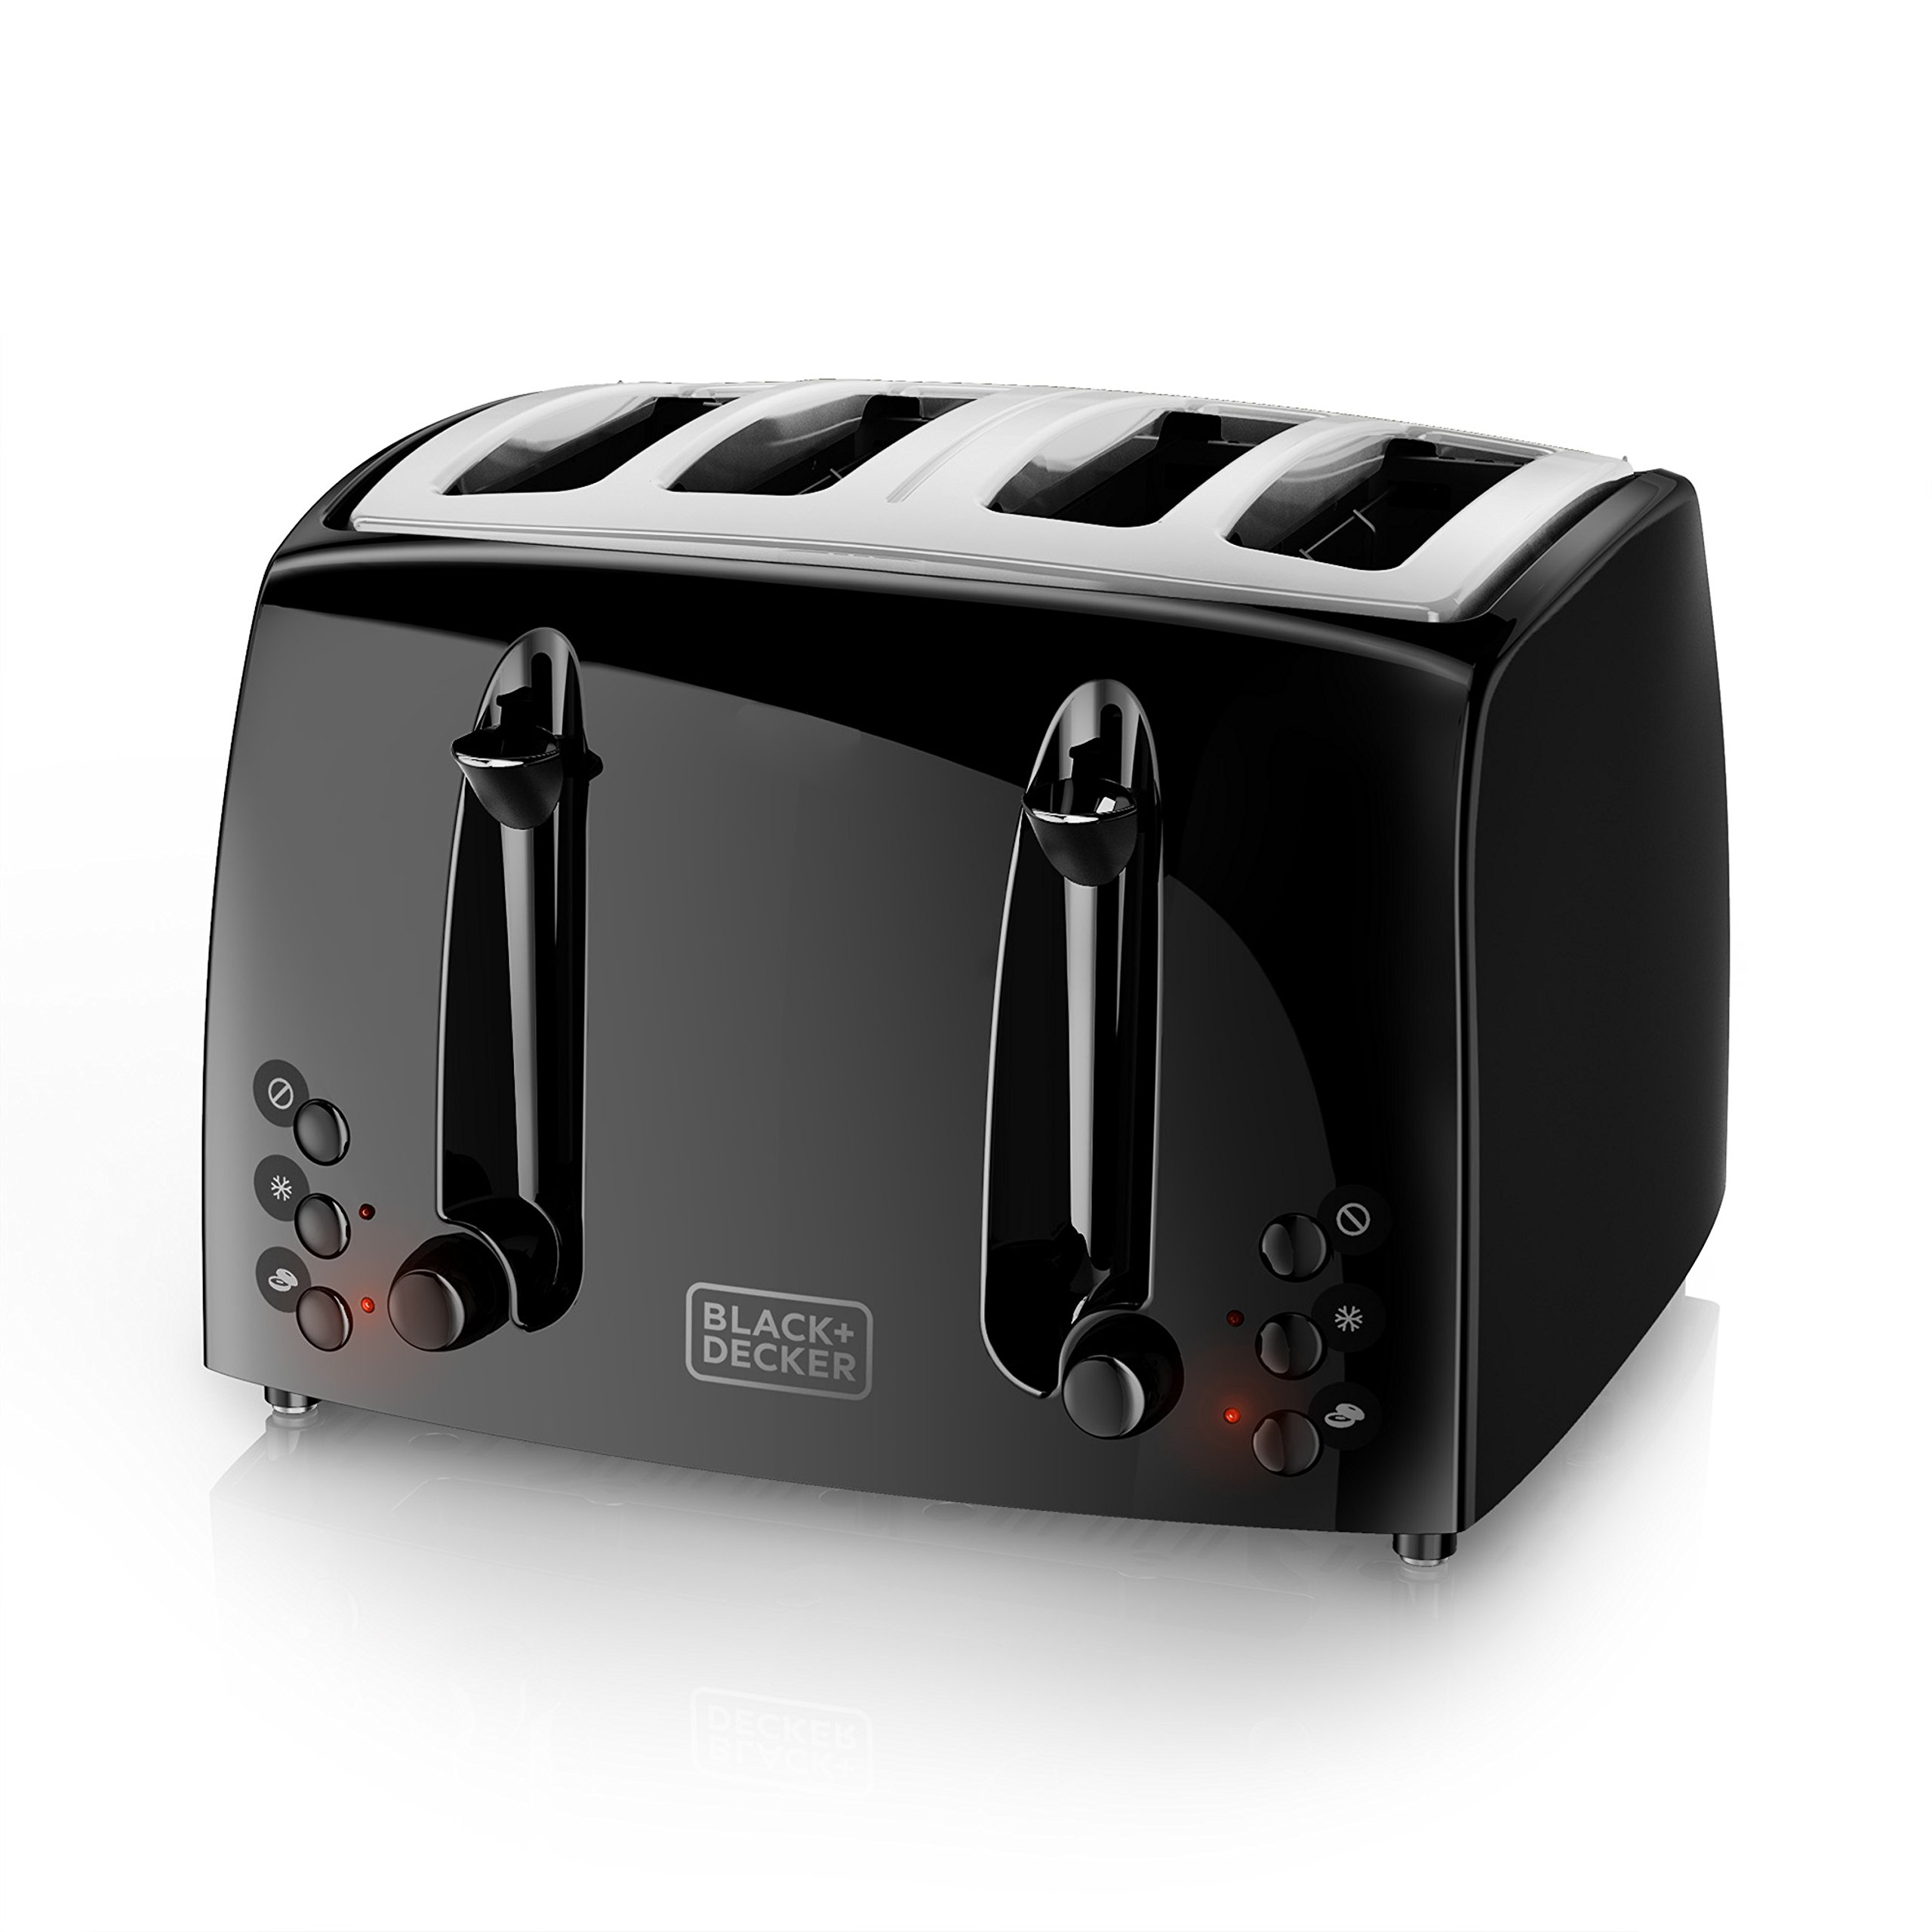 BLACK+DECKER 4-Slice Toaster, Extra-Wide, Black, TR1410BD by BLACK+DECKER